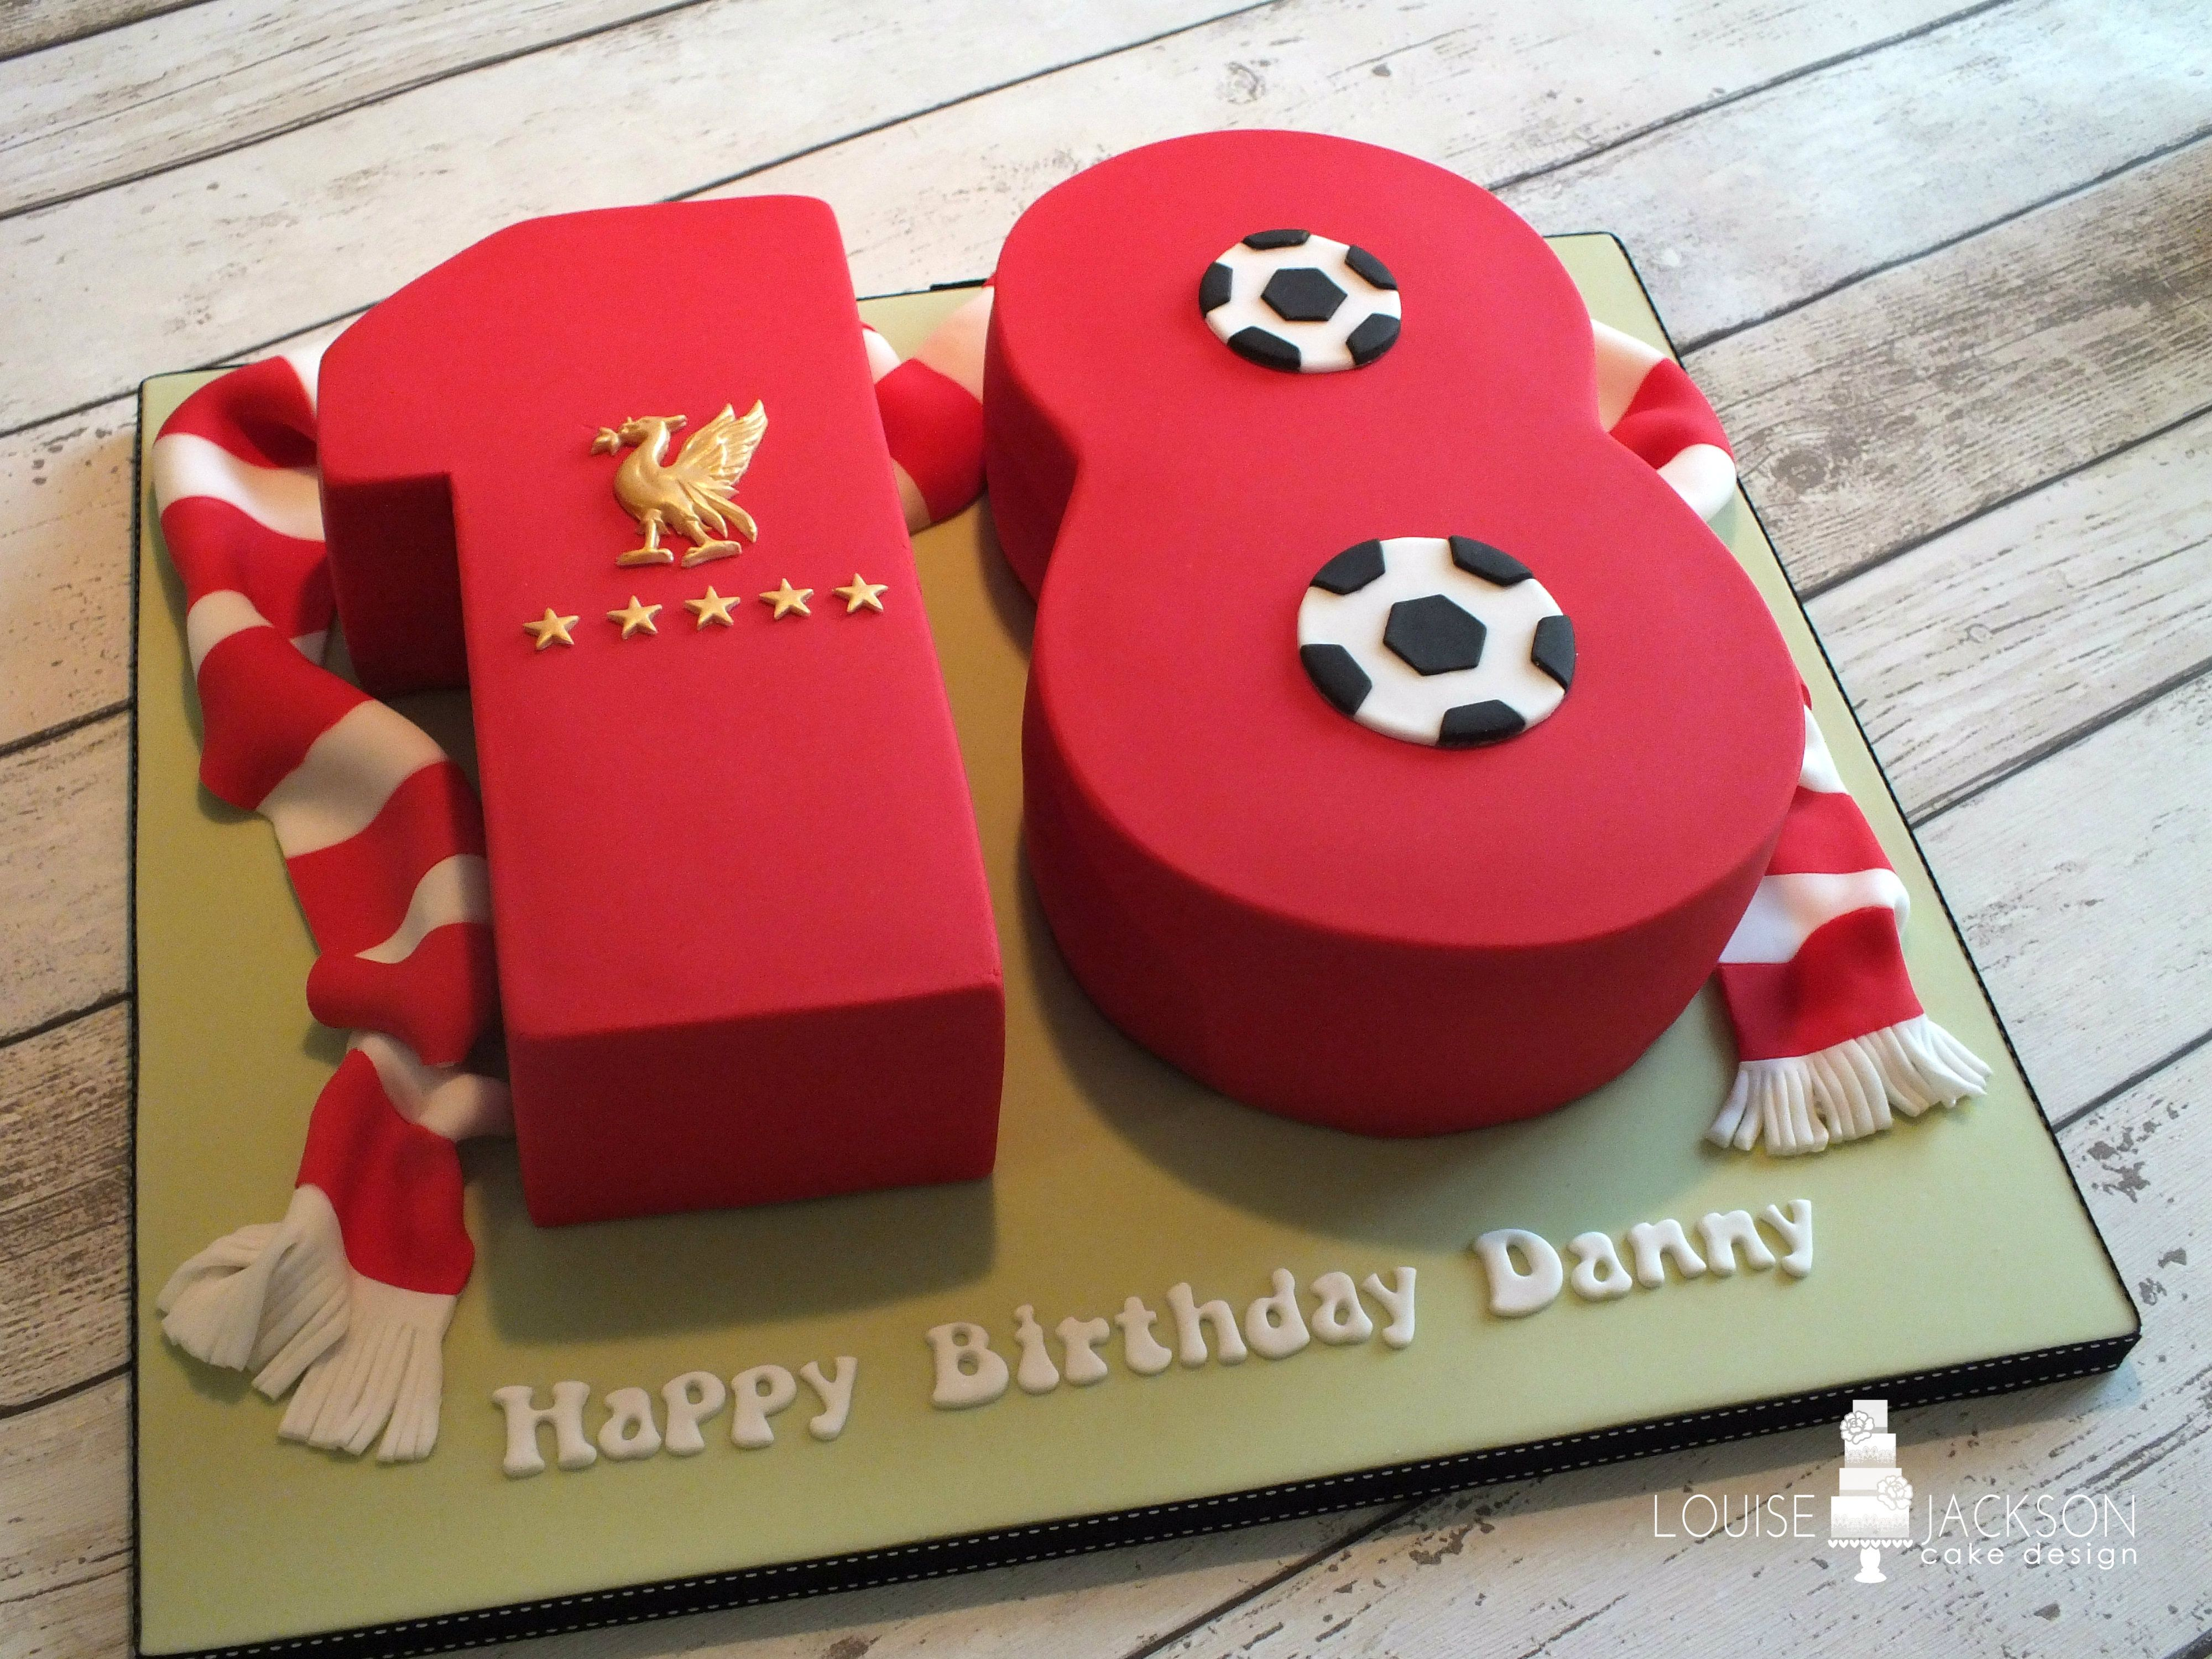 No 18 Birthday Celebration Cake With Liverpool Fc Theme